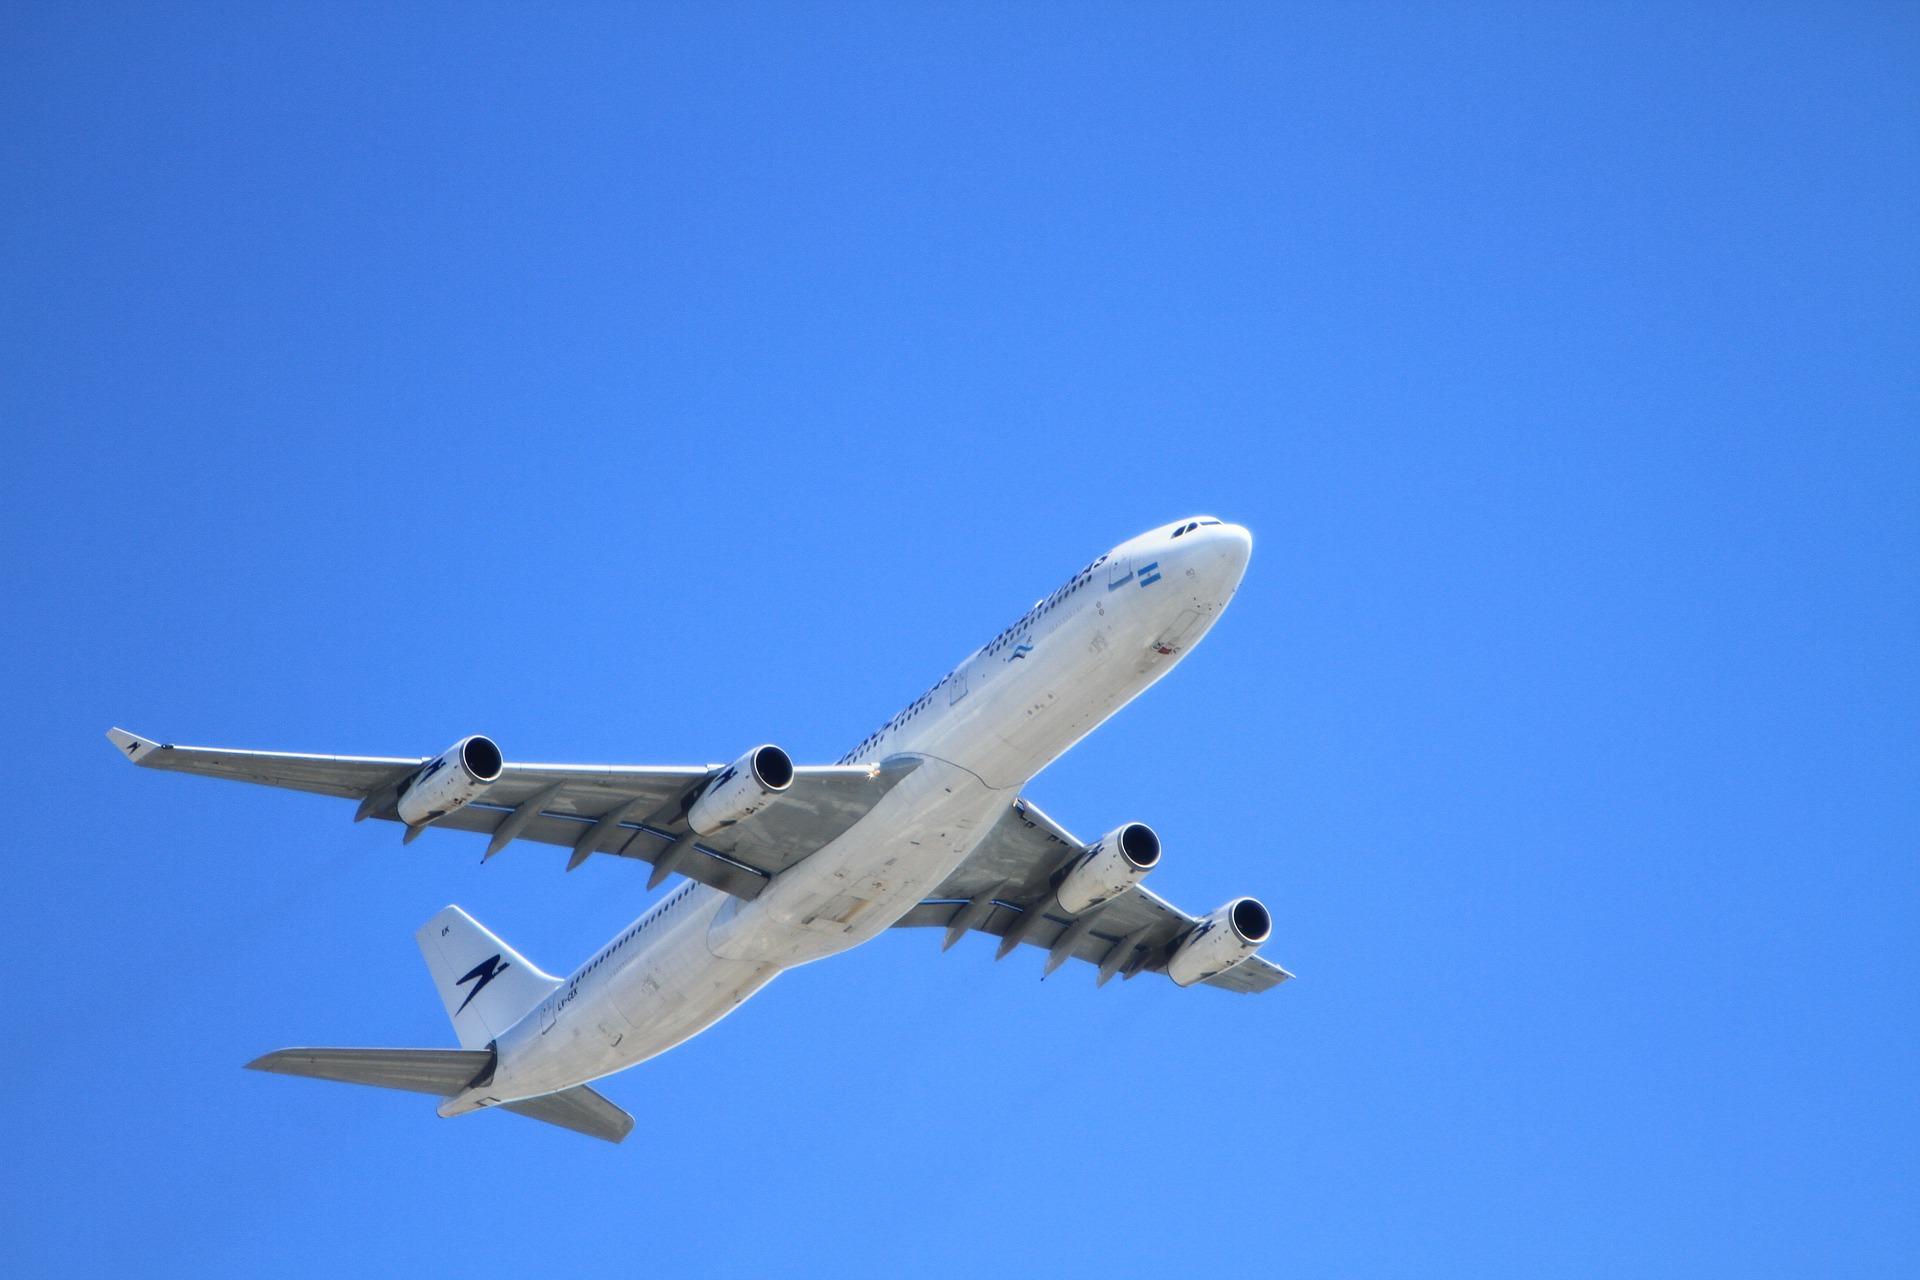 A Liquido ManoLe E Di Regole Bagaglio Lufthansa Ryanair 67yYbgf